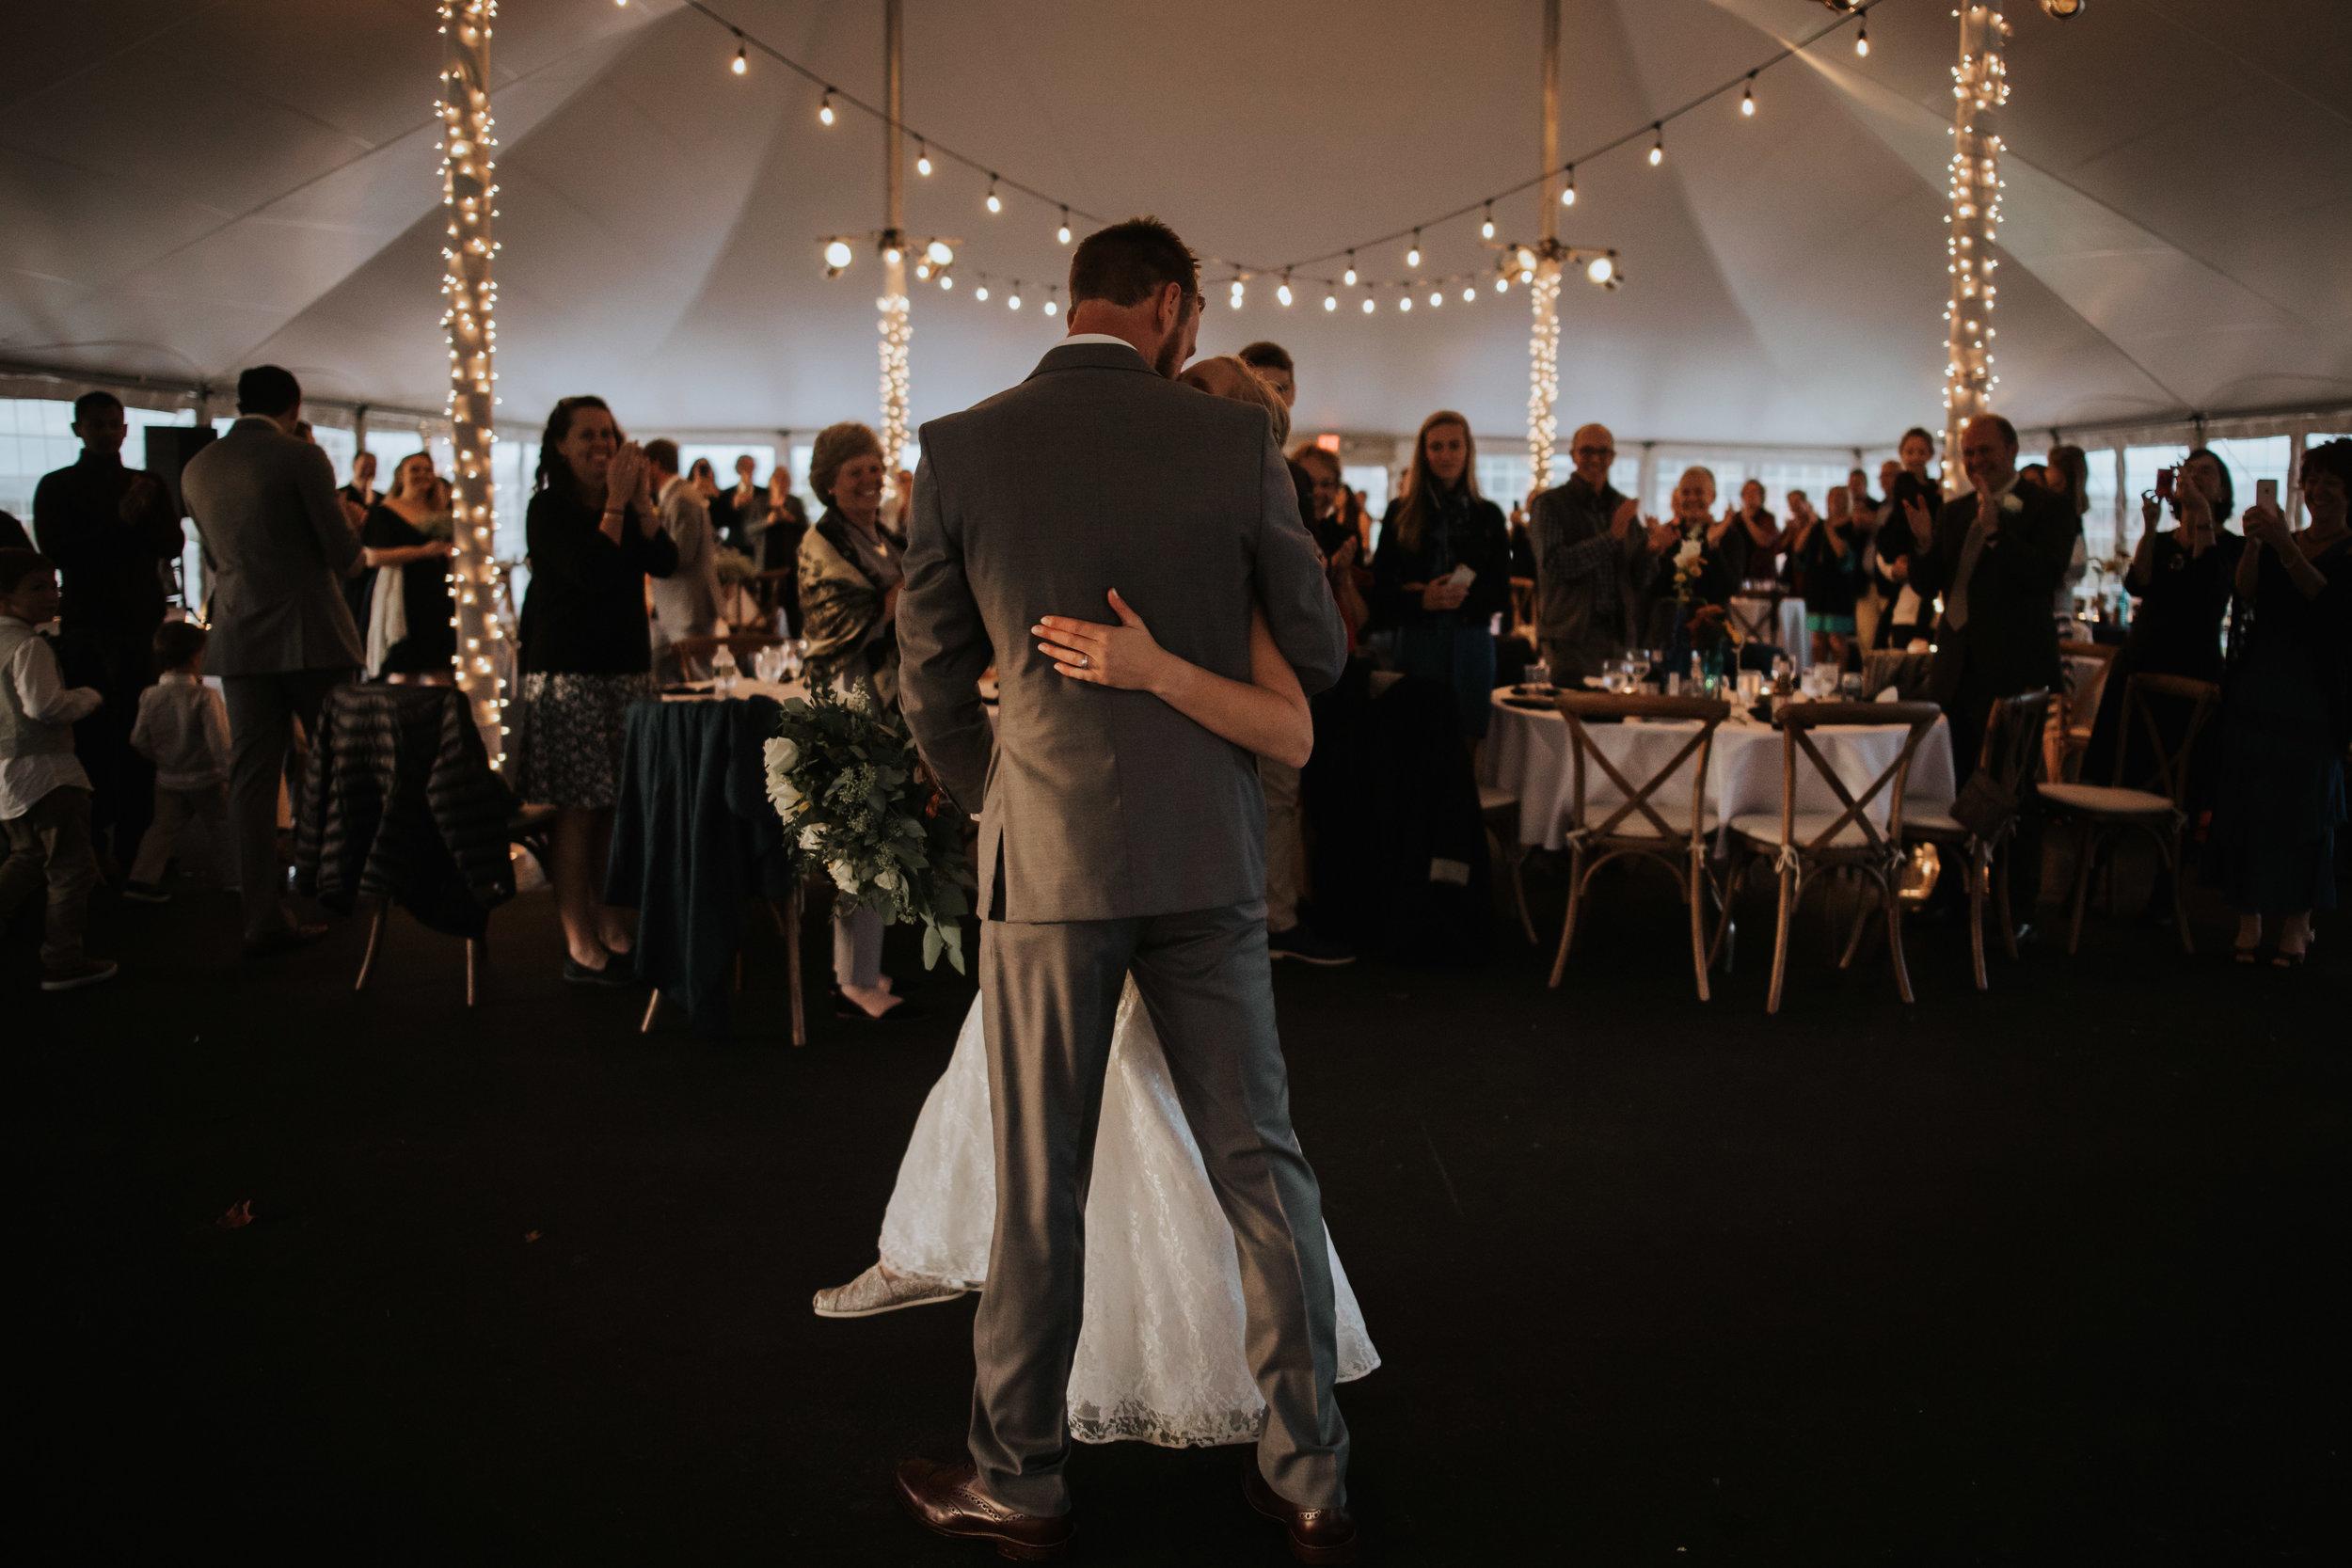 Vermont Wedding | Lorianna Weathers Photography-1422.jpg